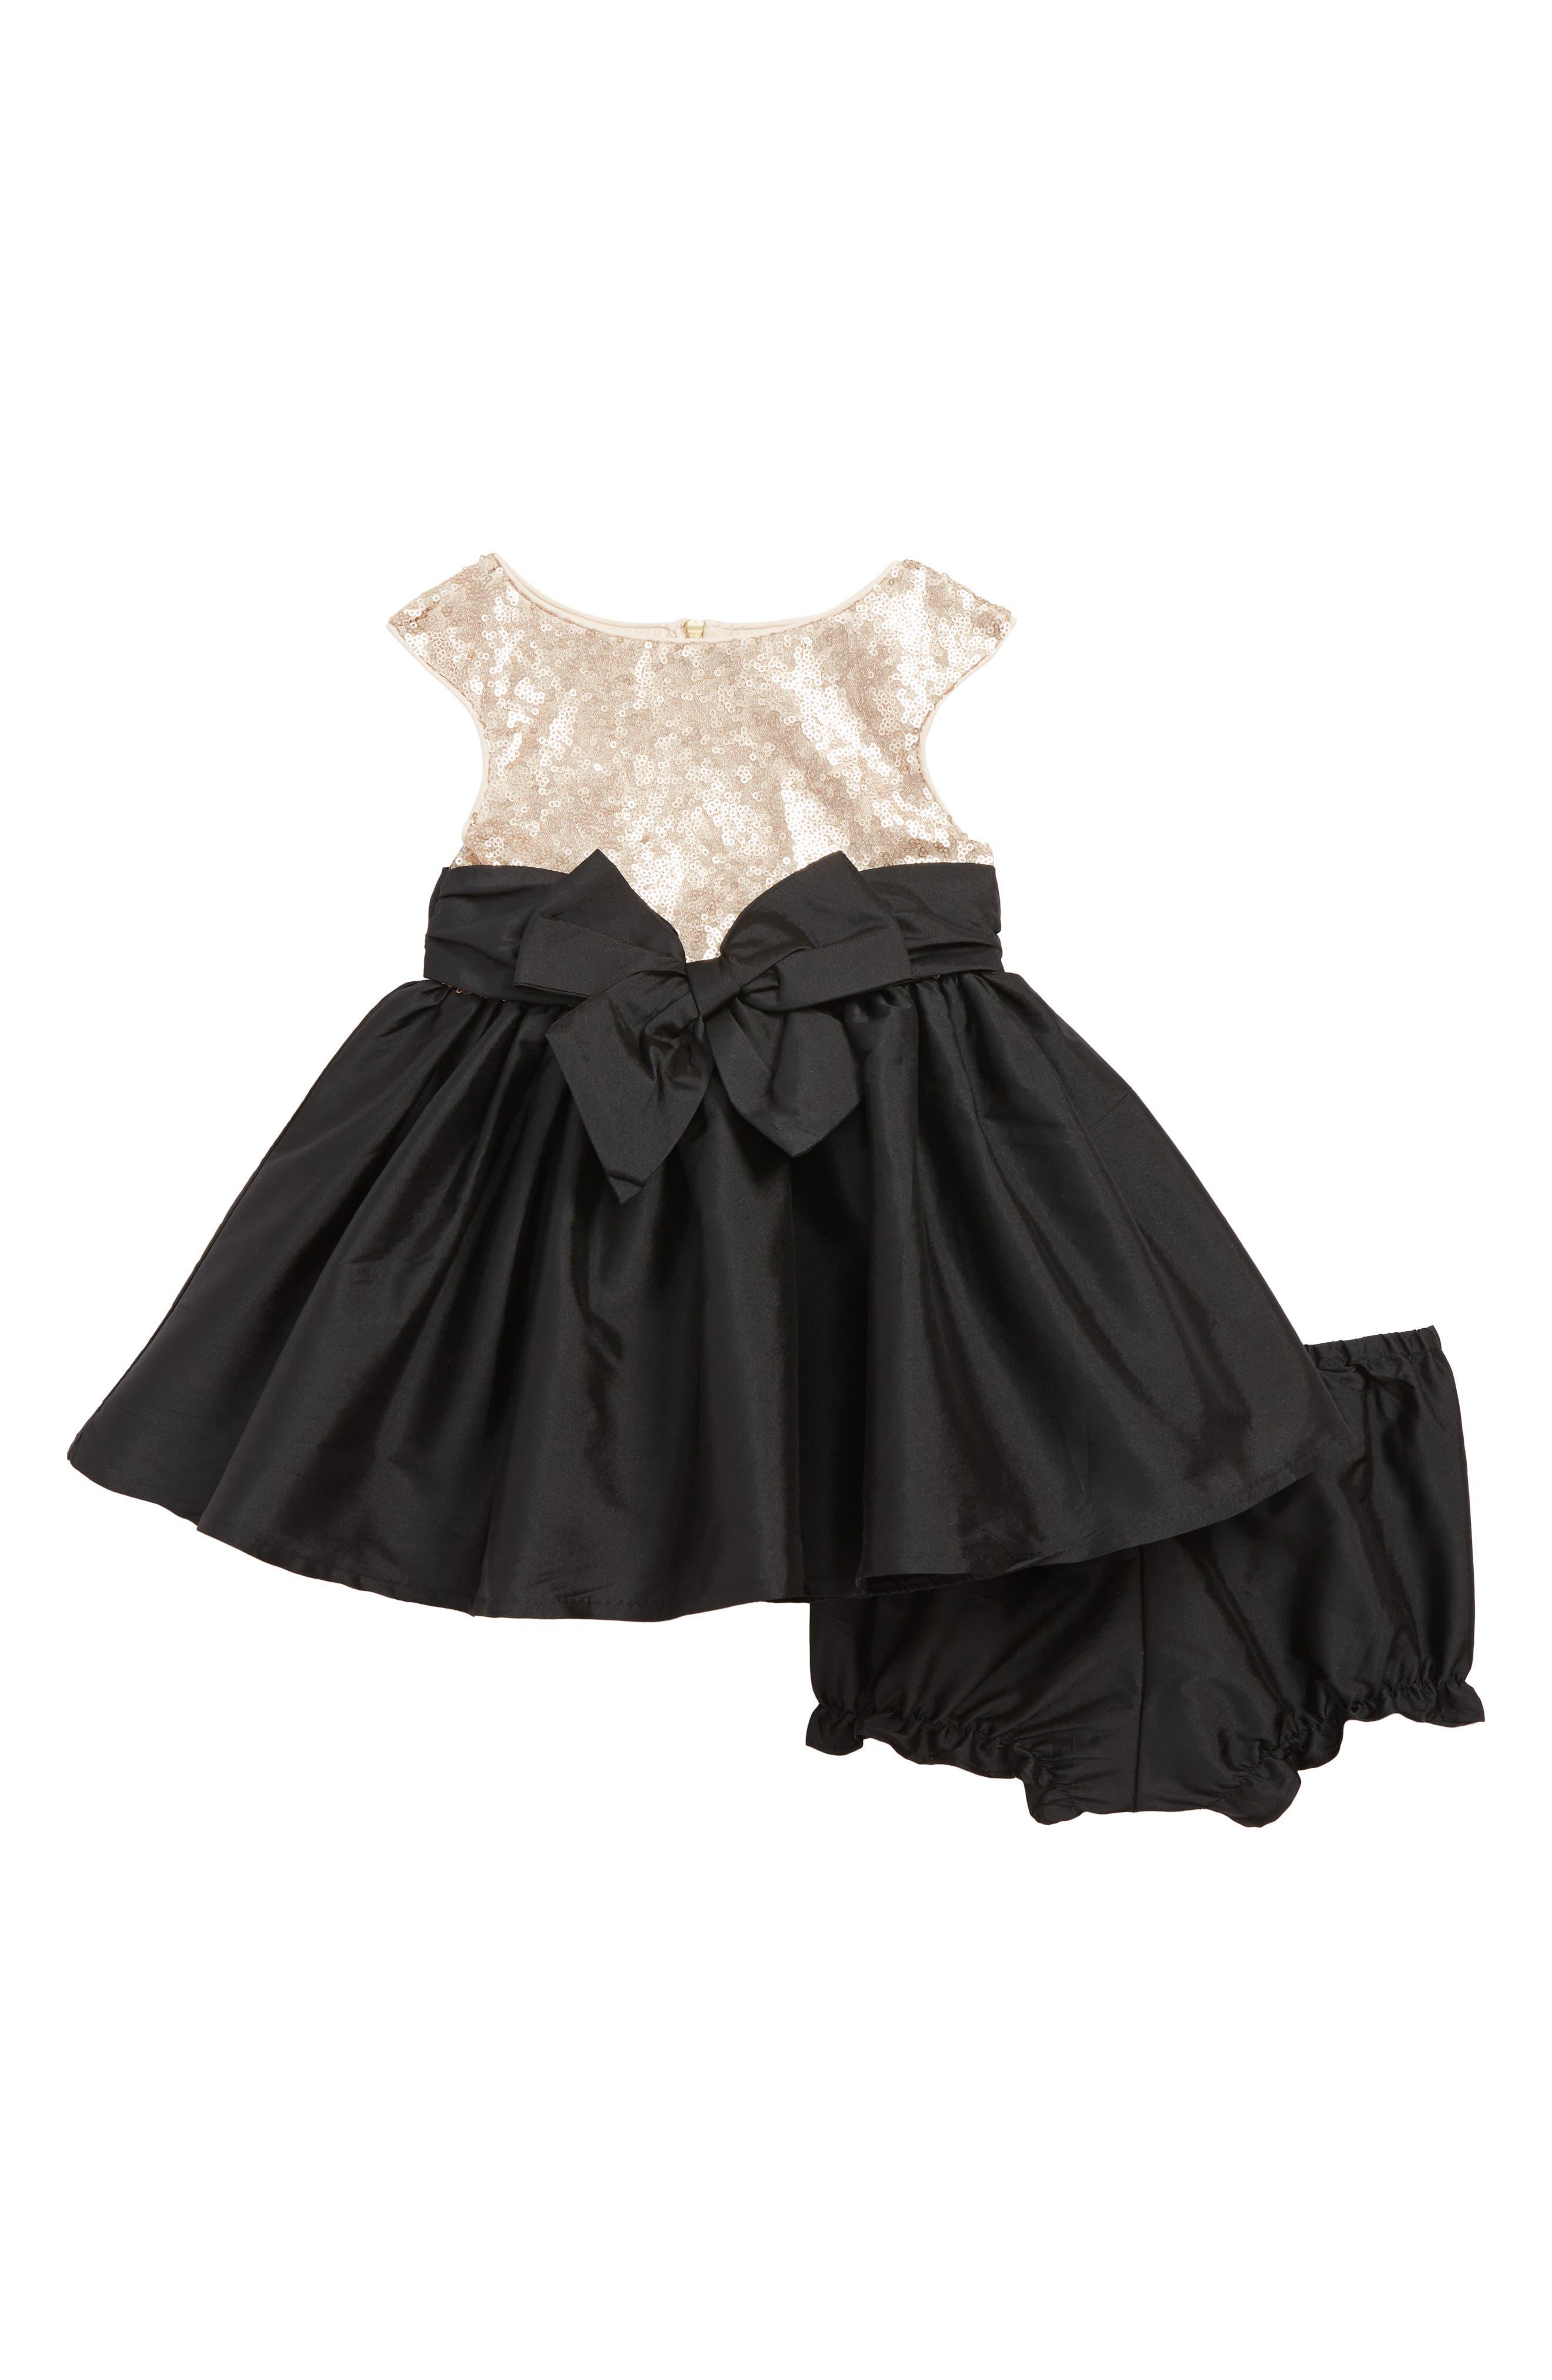 Infant Girls Pippa  Julie Sequin Party Dress Size 12M  Metallic